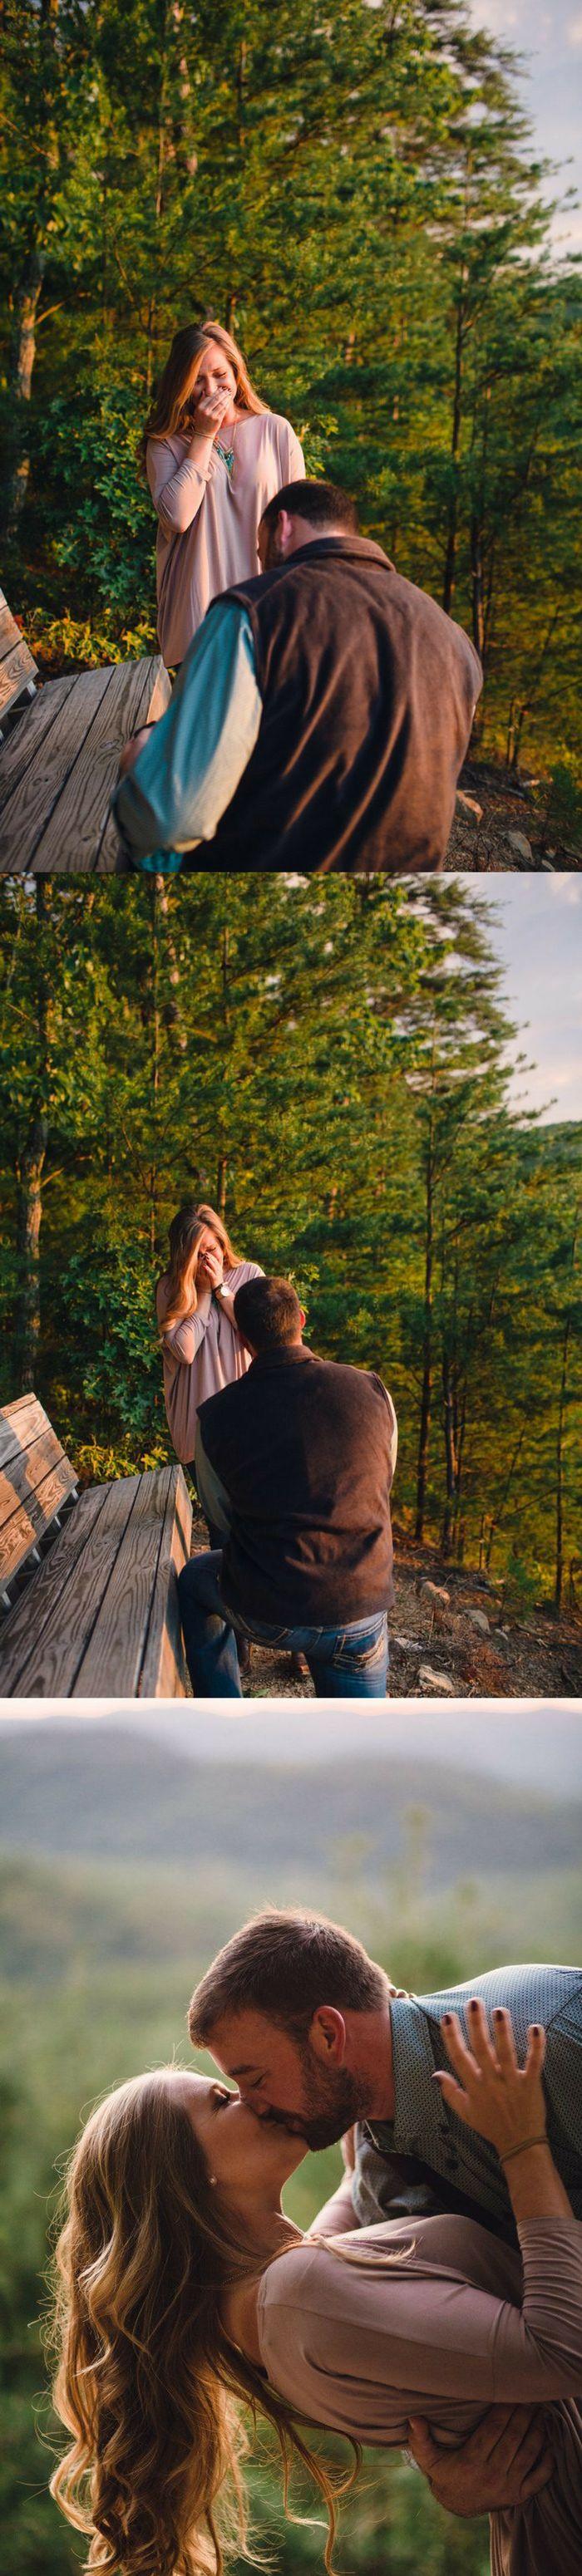 90 best proposal ideas images on pinterest proposals marriage